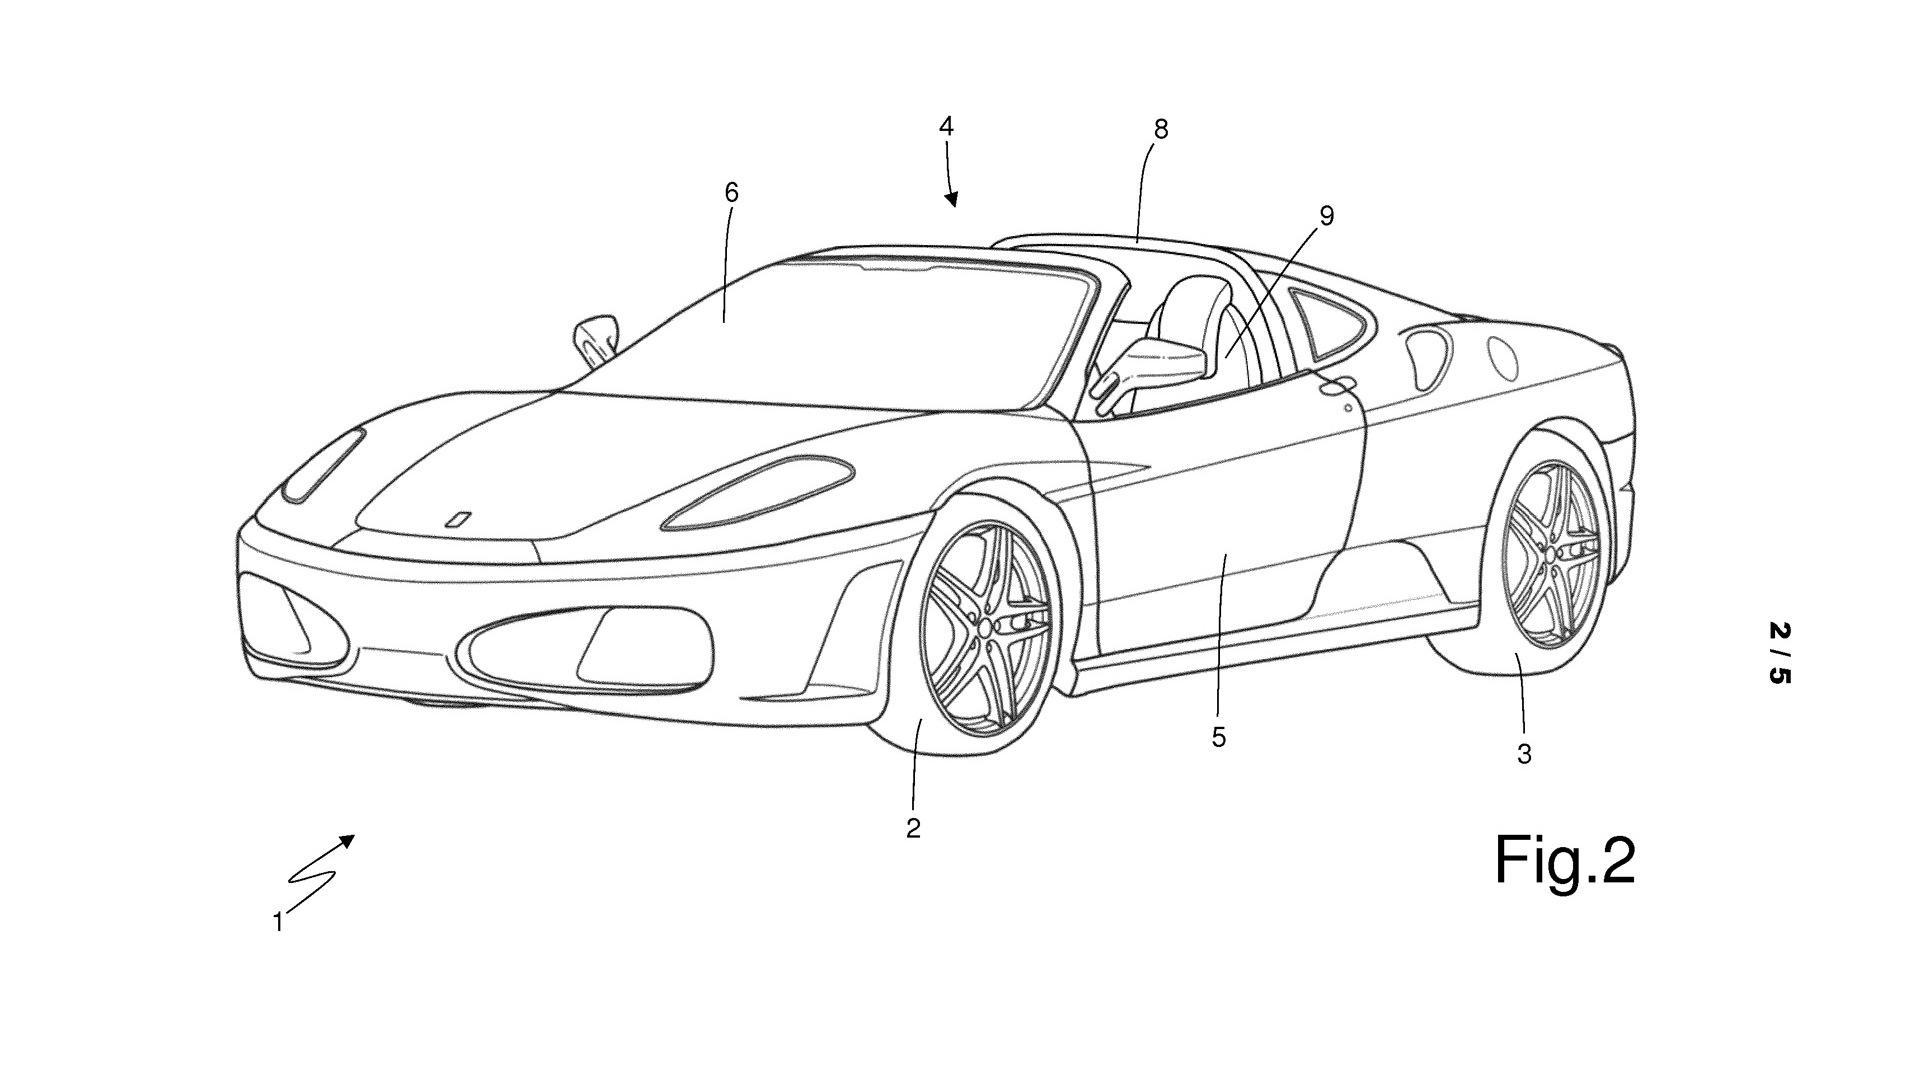 Ferrari patent for car with targa top